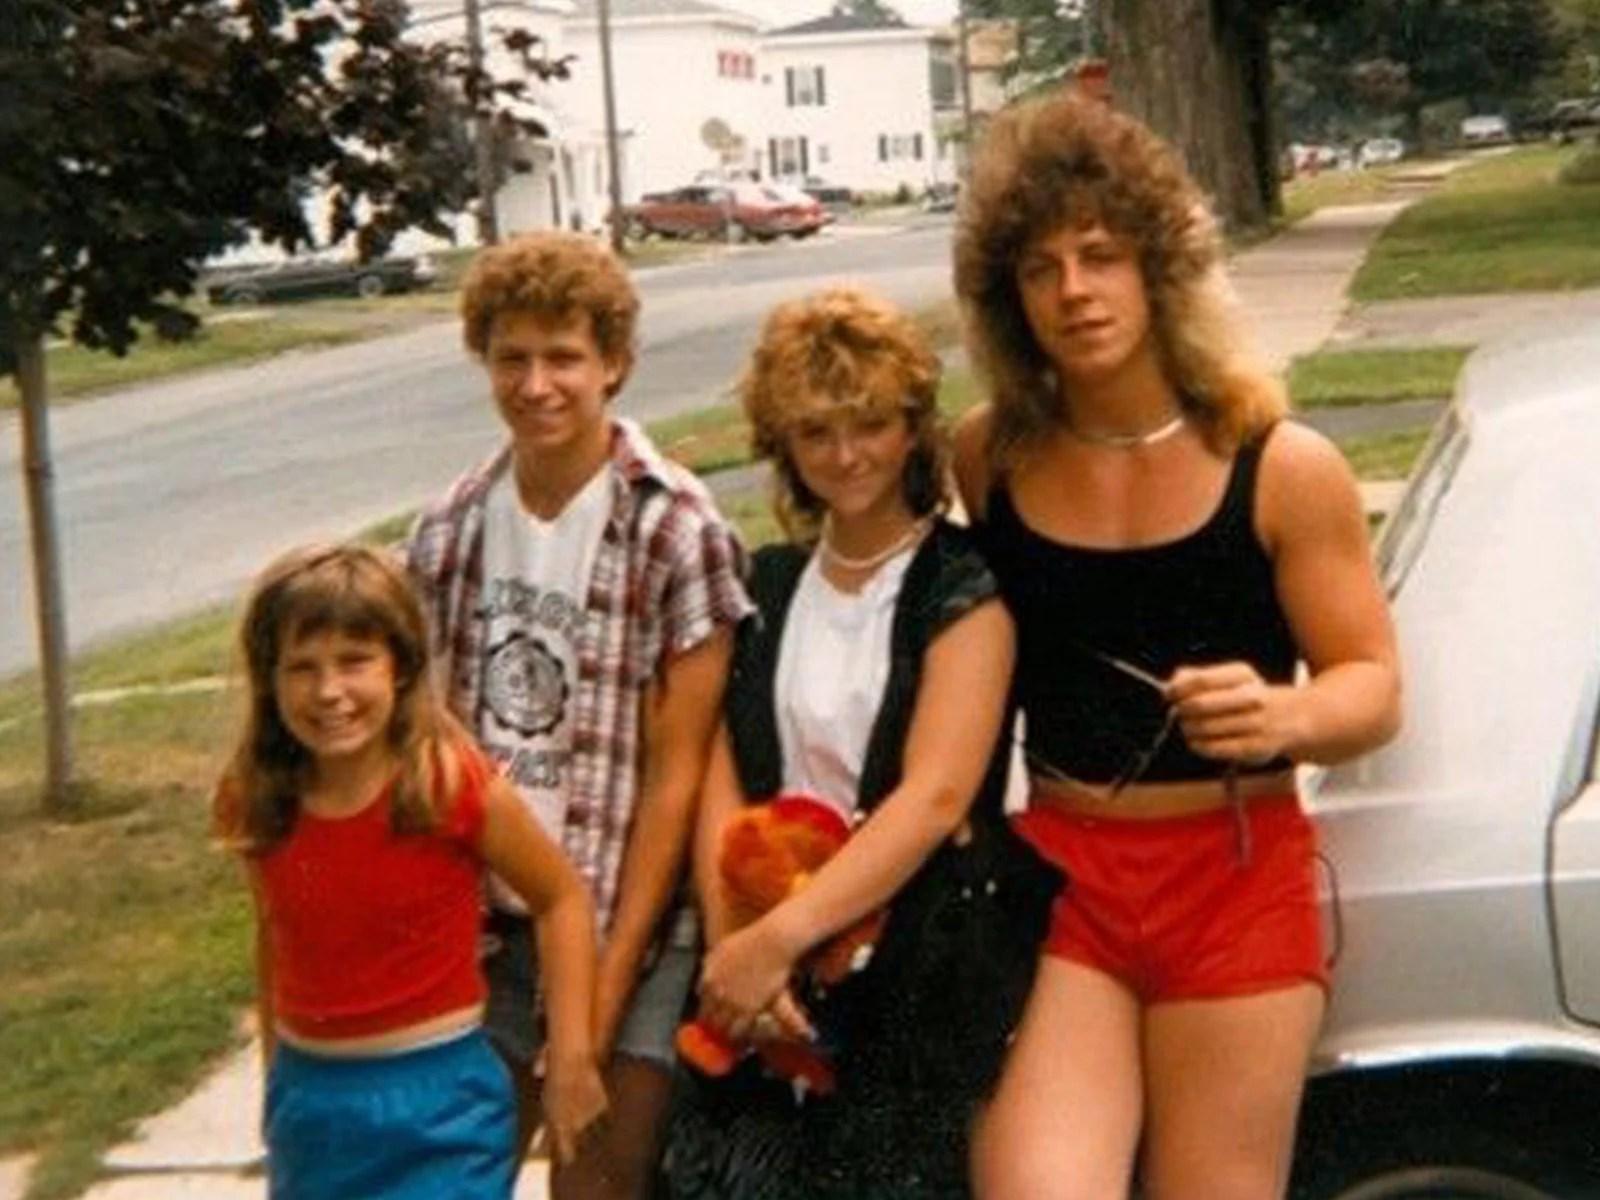 Awkward 80s Big Hair And Wild Style